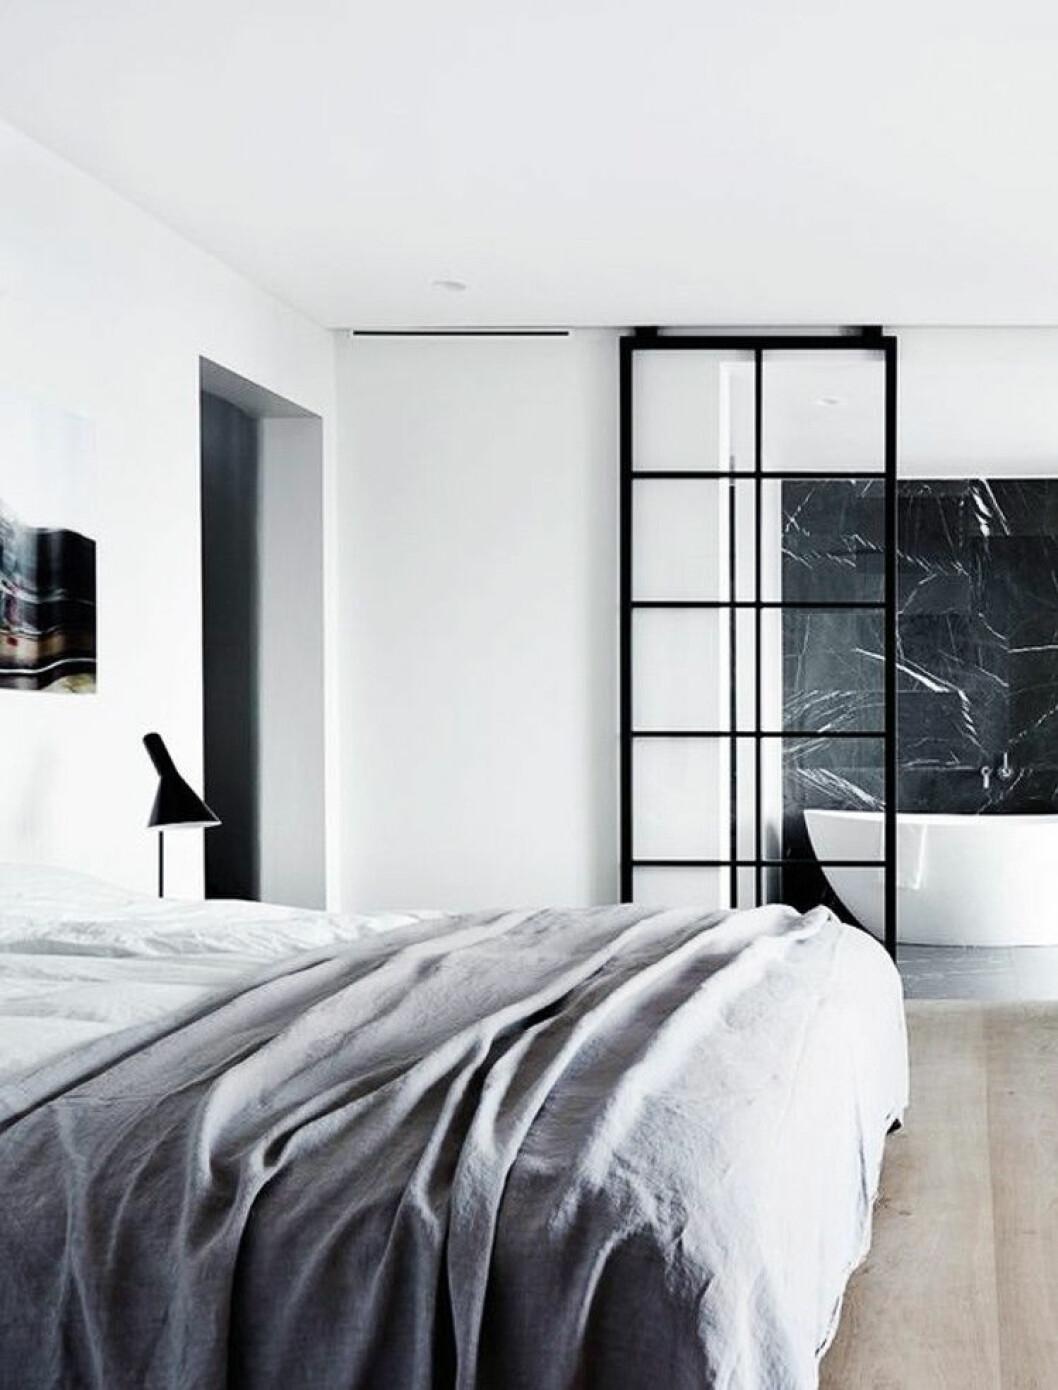 09. glass-wall